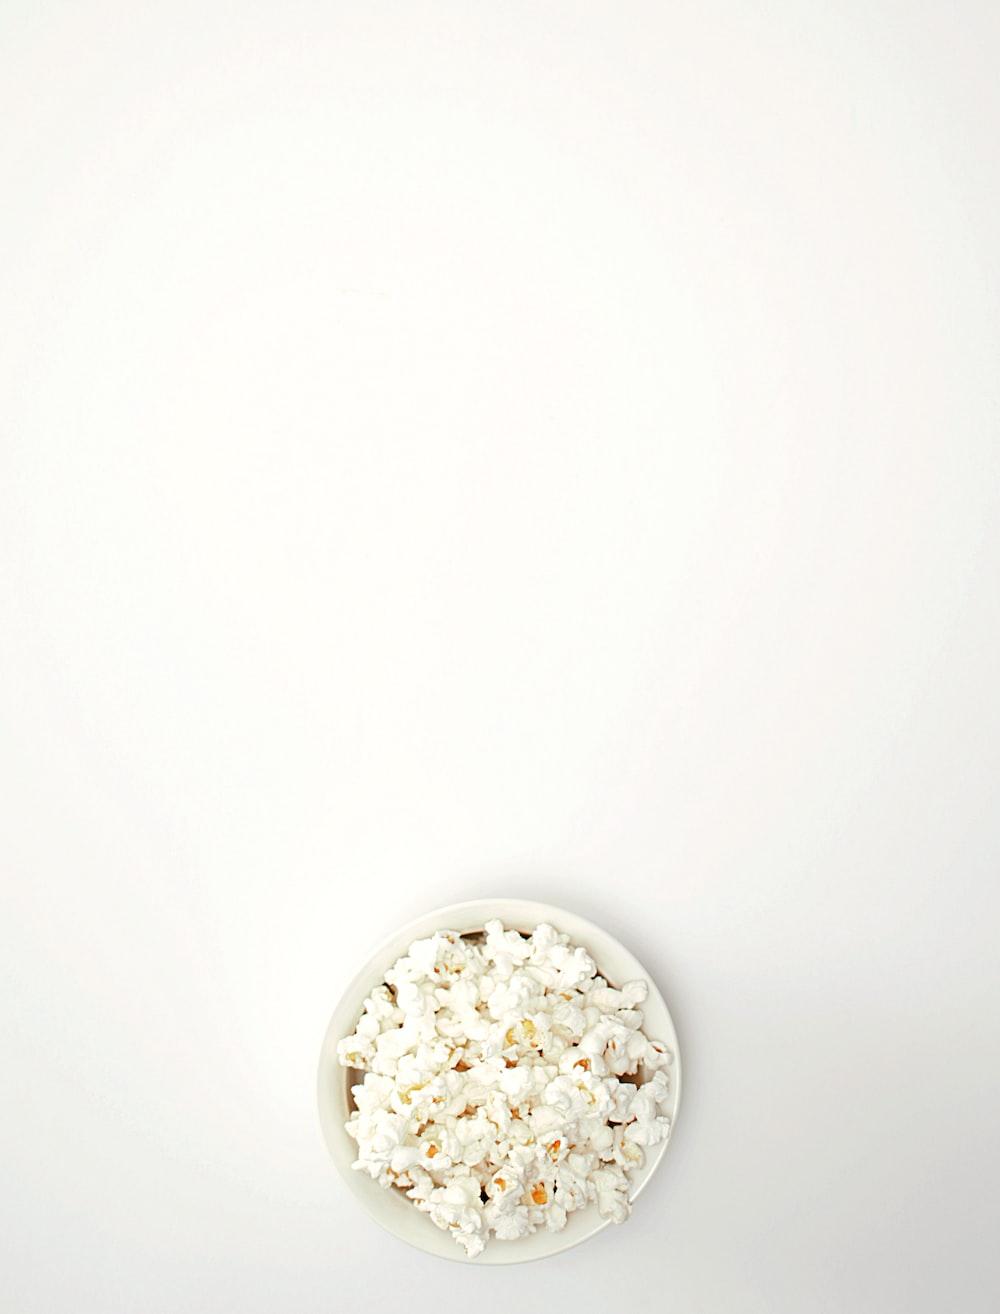 pop corn in bowl